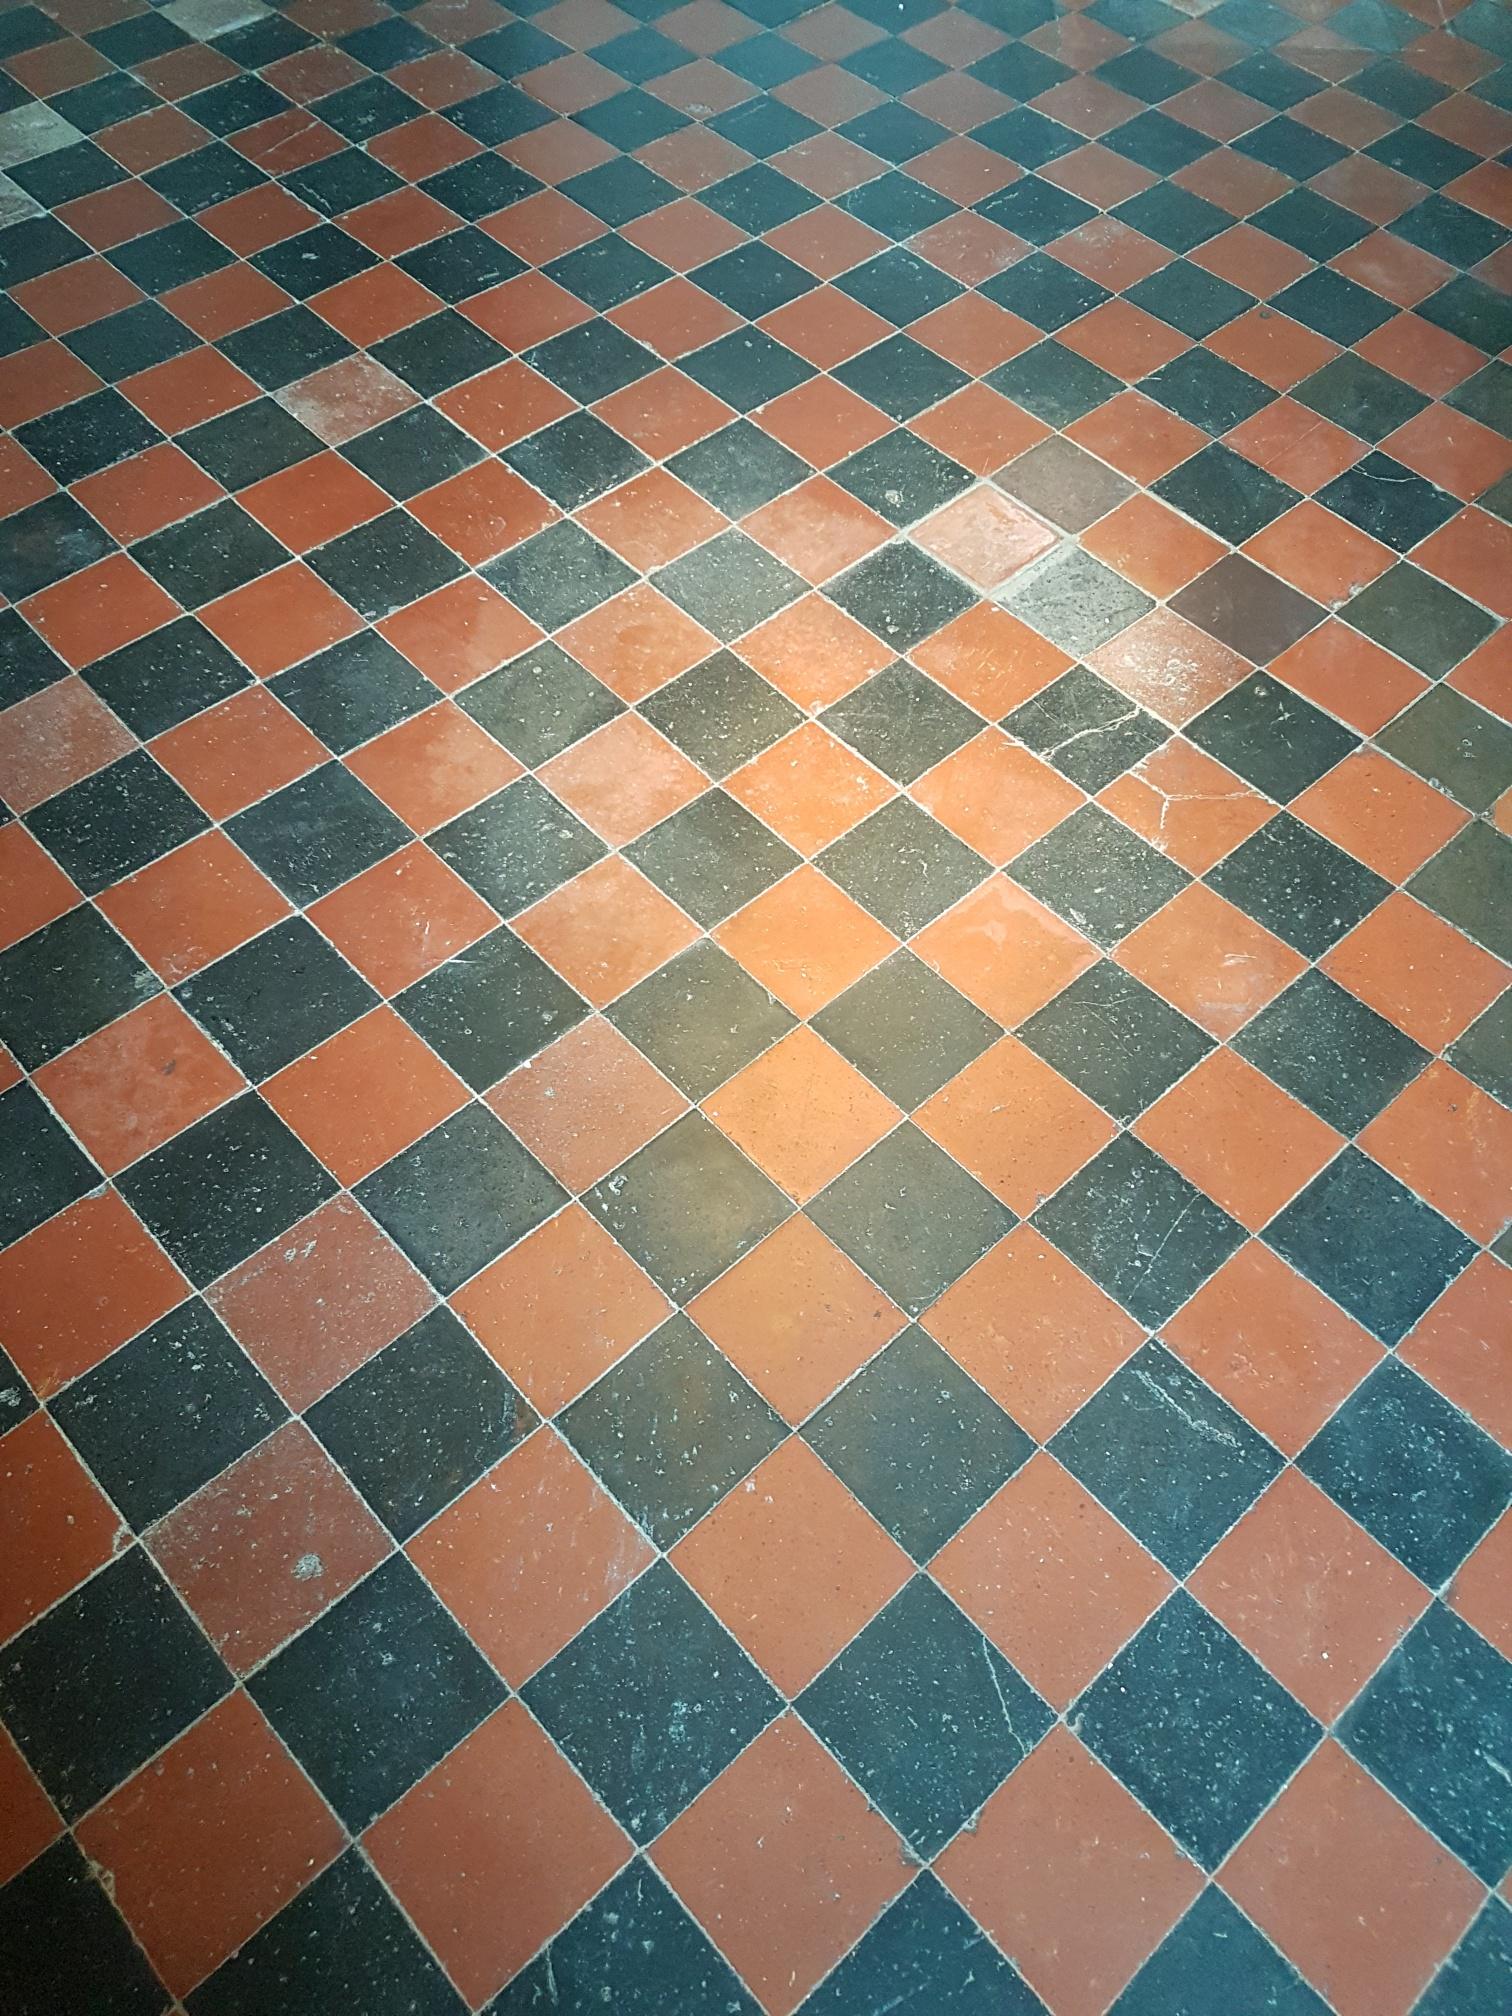 Quarry Tiled Floor Before Cleaning Knaresbrorough